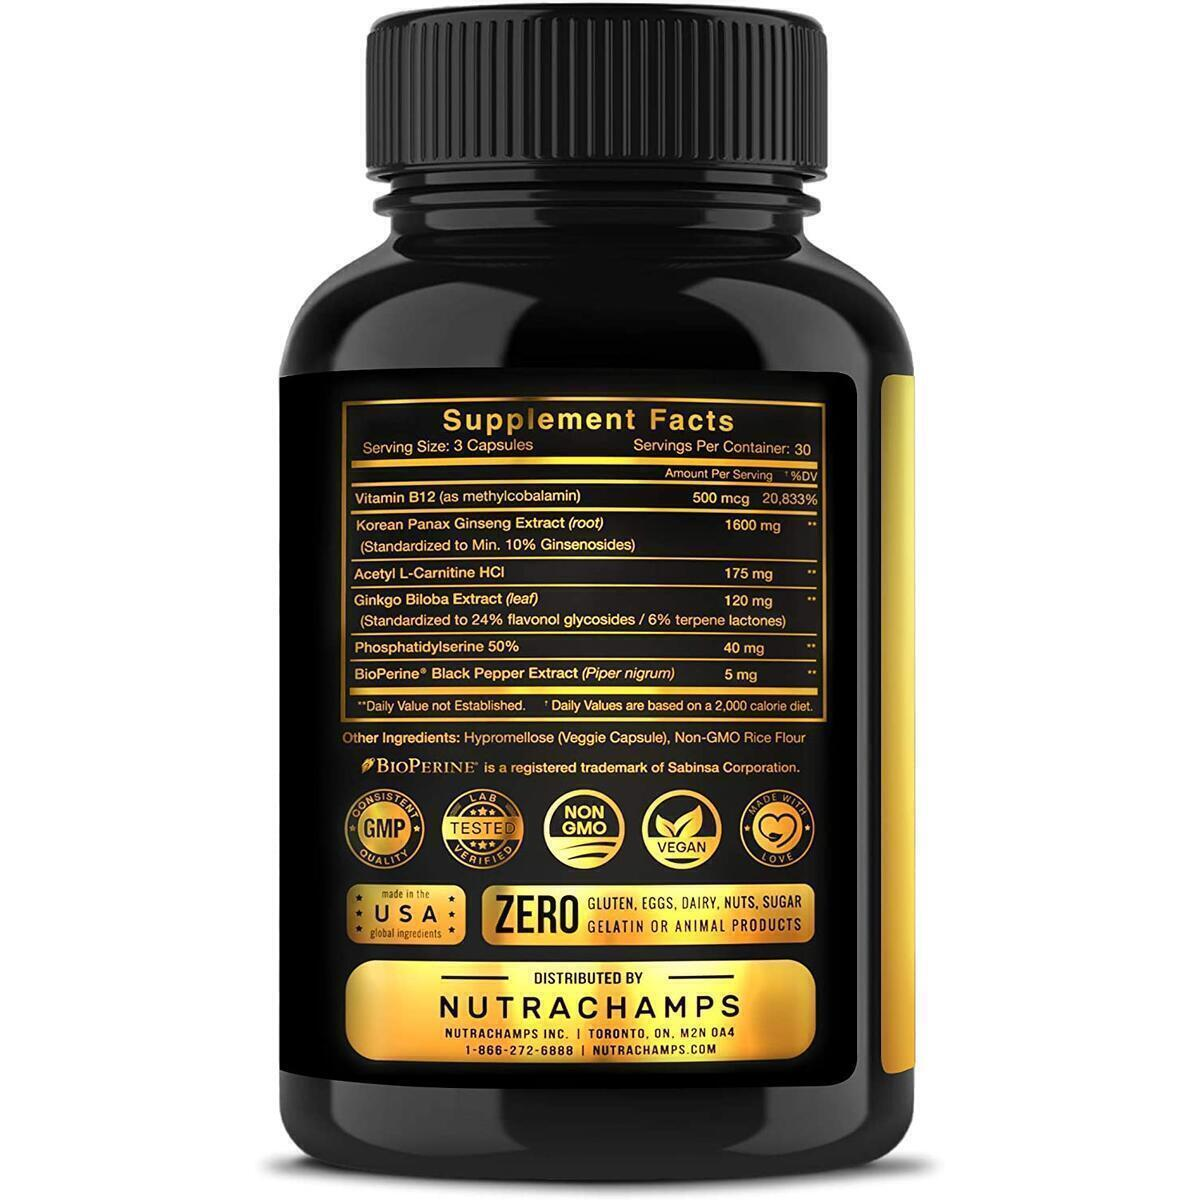 Korean Red Panax Ginseng 1600mg Gold Series - Vegan Capsules with Ginkgo Biloba, Vitamin B12, Acetyl L-Carnitine & BioPerine - Maximum Strength Root Extract 10% Ginsenosides - Energy & Focus Pills